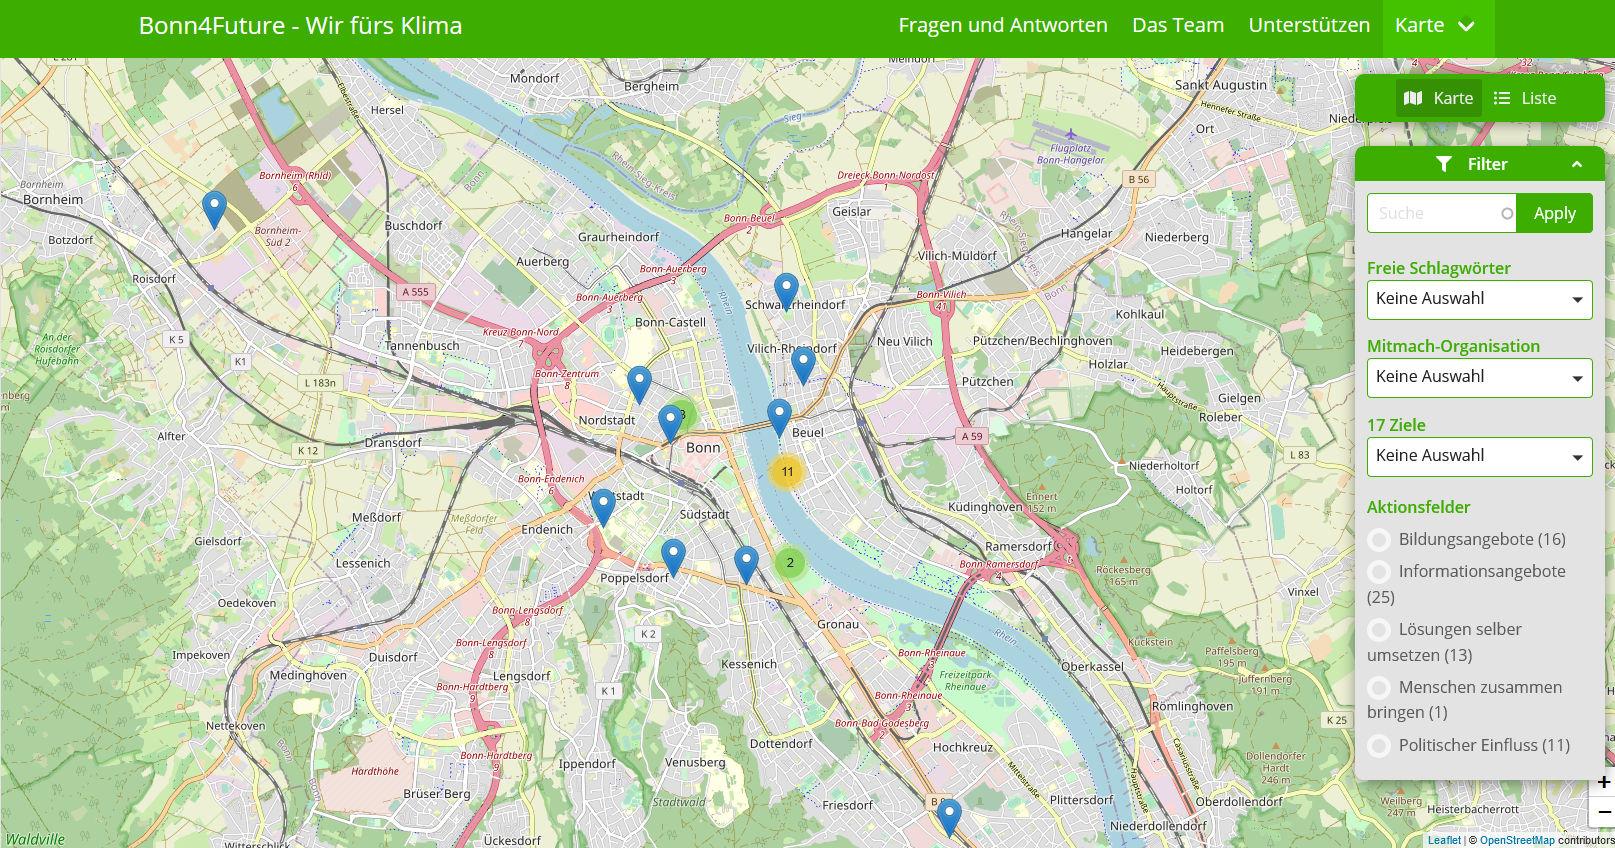 Screenshot von der Organisations-Karte unter https://www.bonn4future.de/de/map